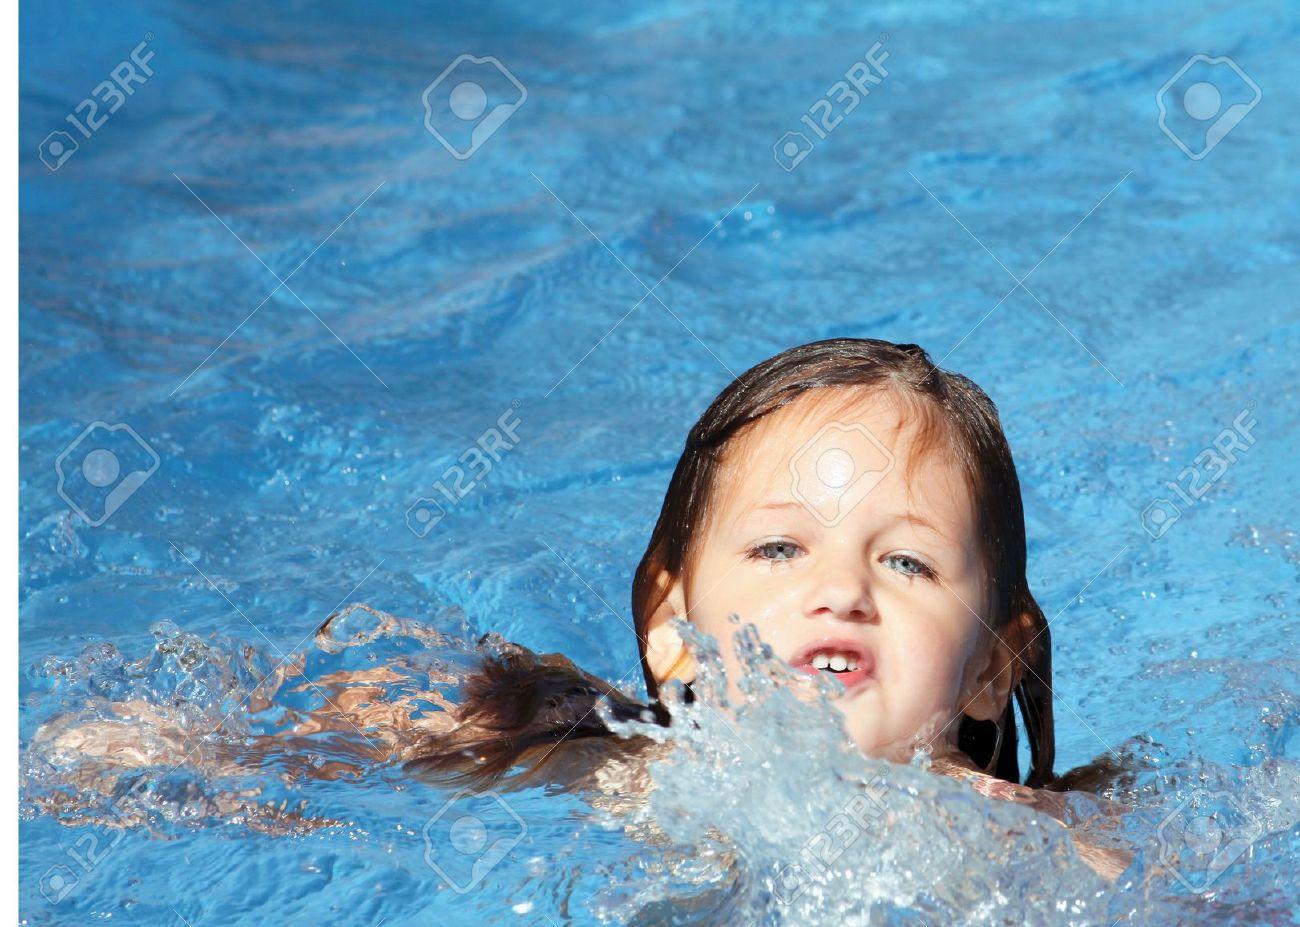 child trying to swim unaided Stock Photo - 5061760